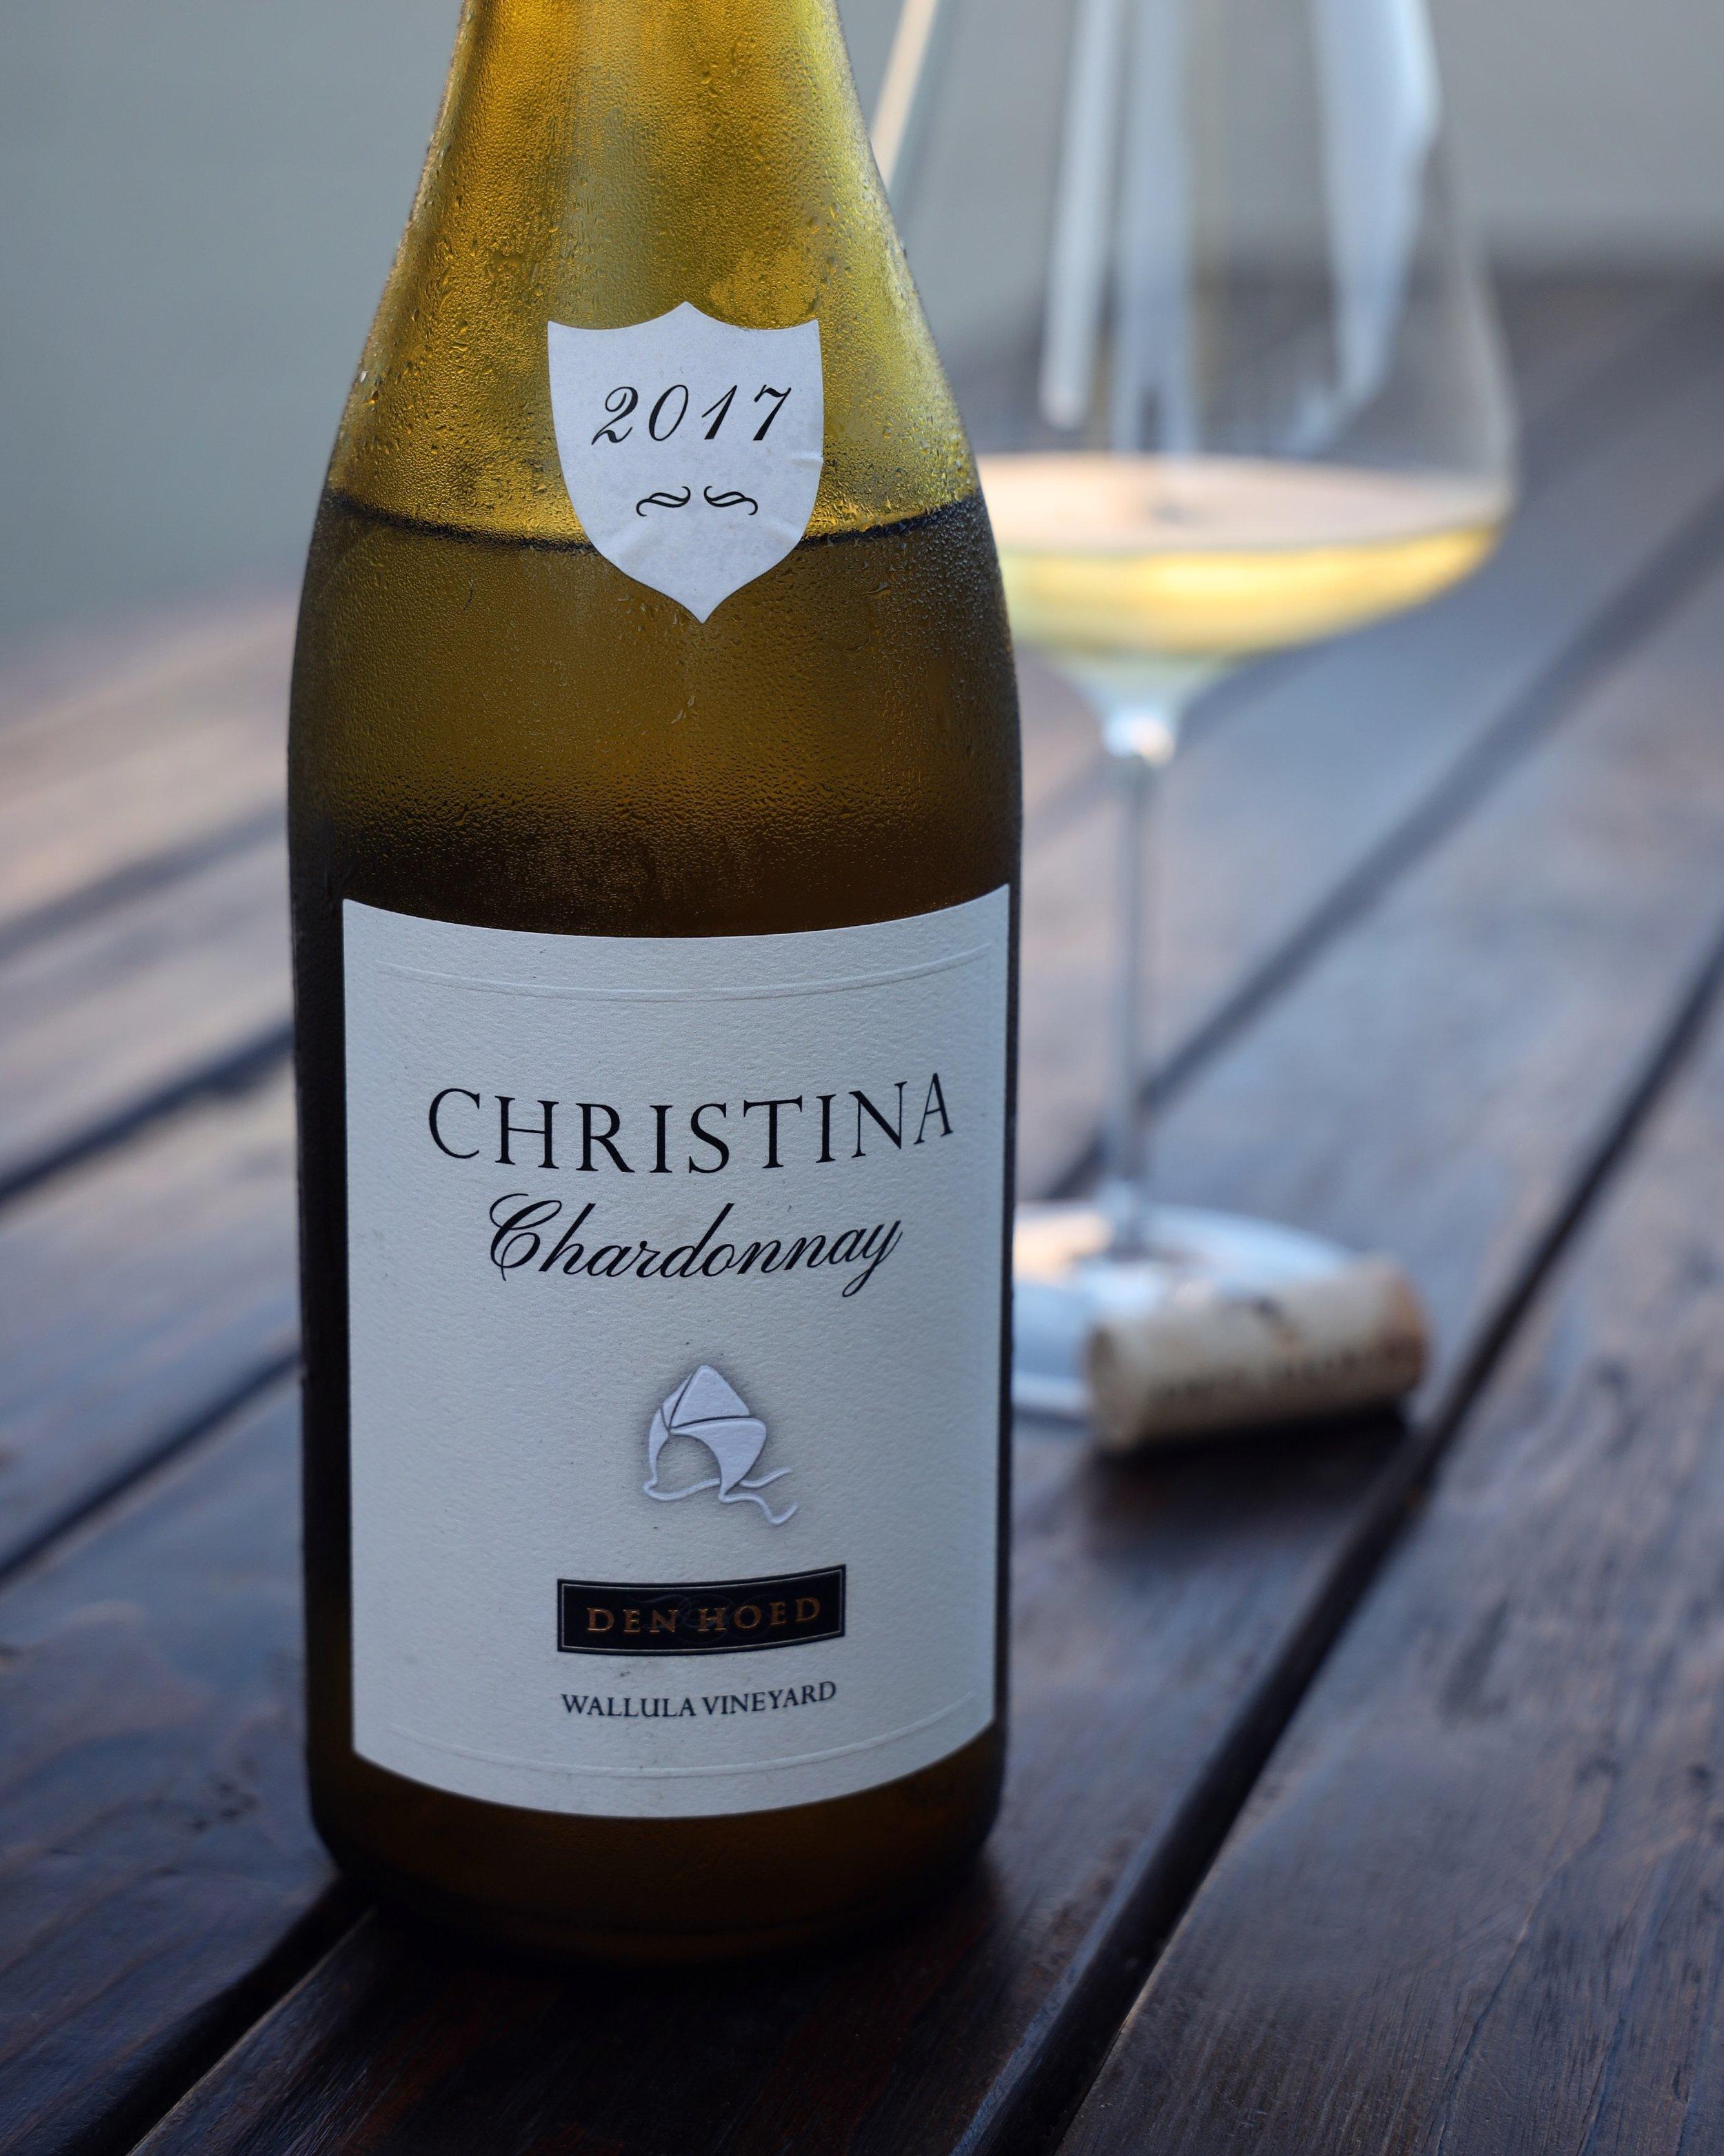 Den Hoed - Christina Chardonnay .jpg